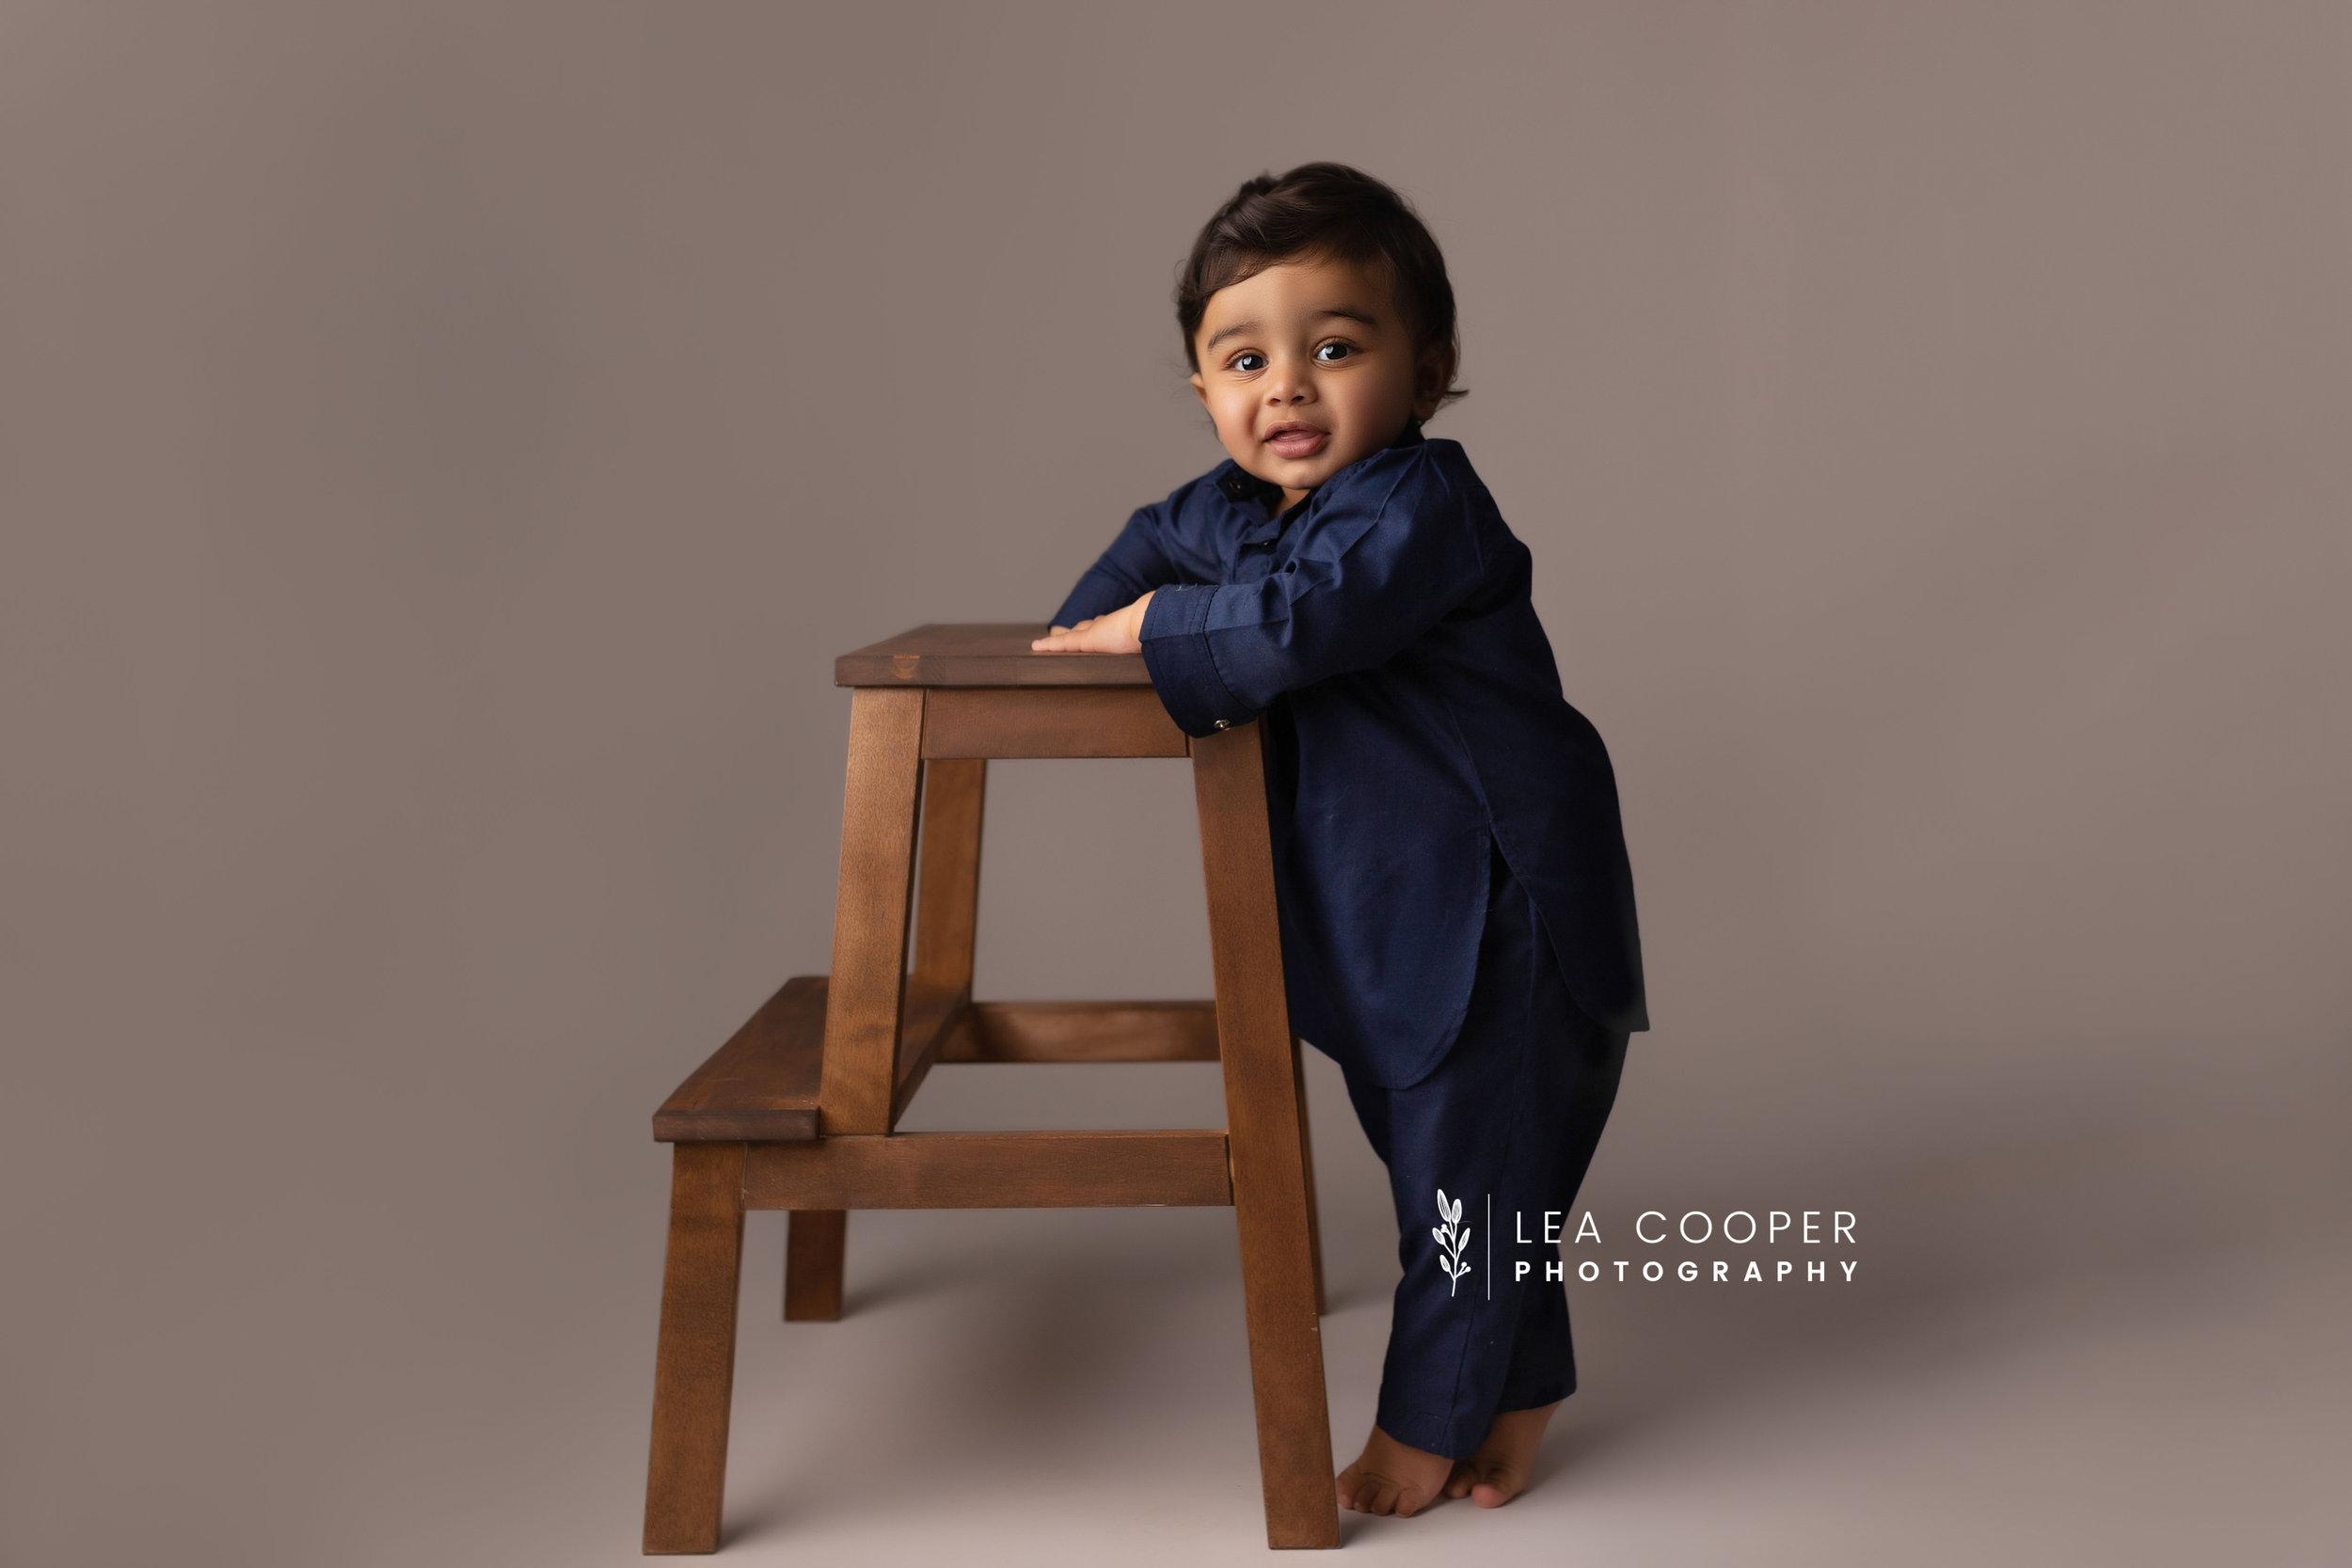 LEA-COOPER-PHOTOGRAPHY-CAKE-SMASH-PHOTOGRAPHER-WILLENALL-WOLVERHAMPTON-CHILD-PHOTOSHOOT-1ST—BIRTHDAY-PICTURES-WEDNESBURY-WALSALL-DUDLEY-WEST-MIDLANDS-UK-1.JPG